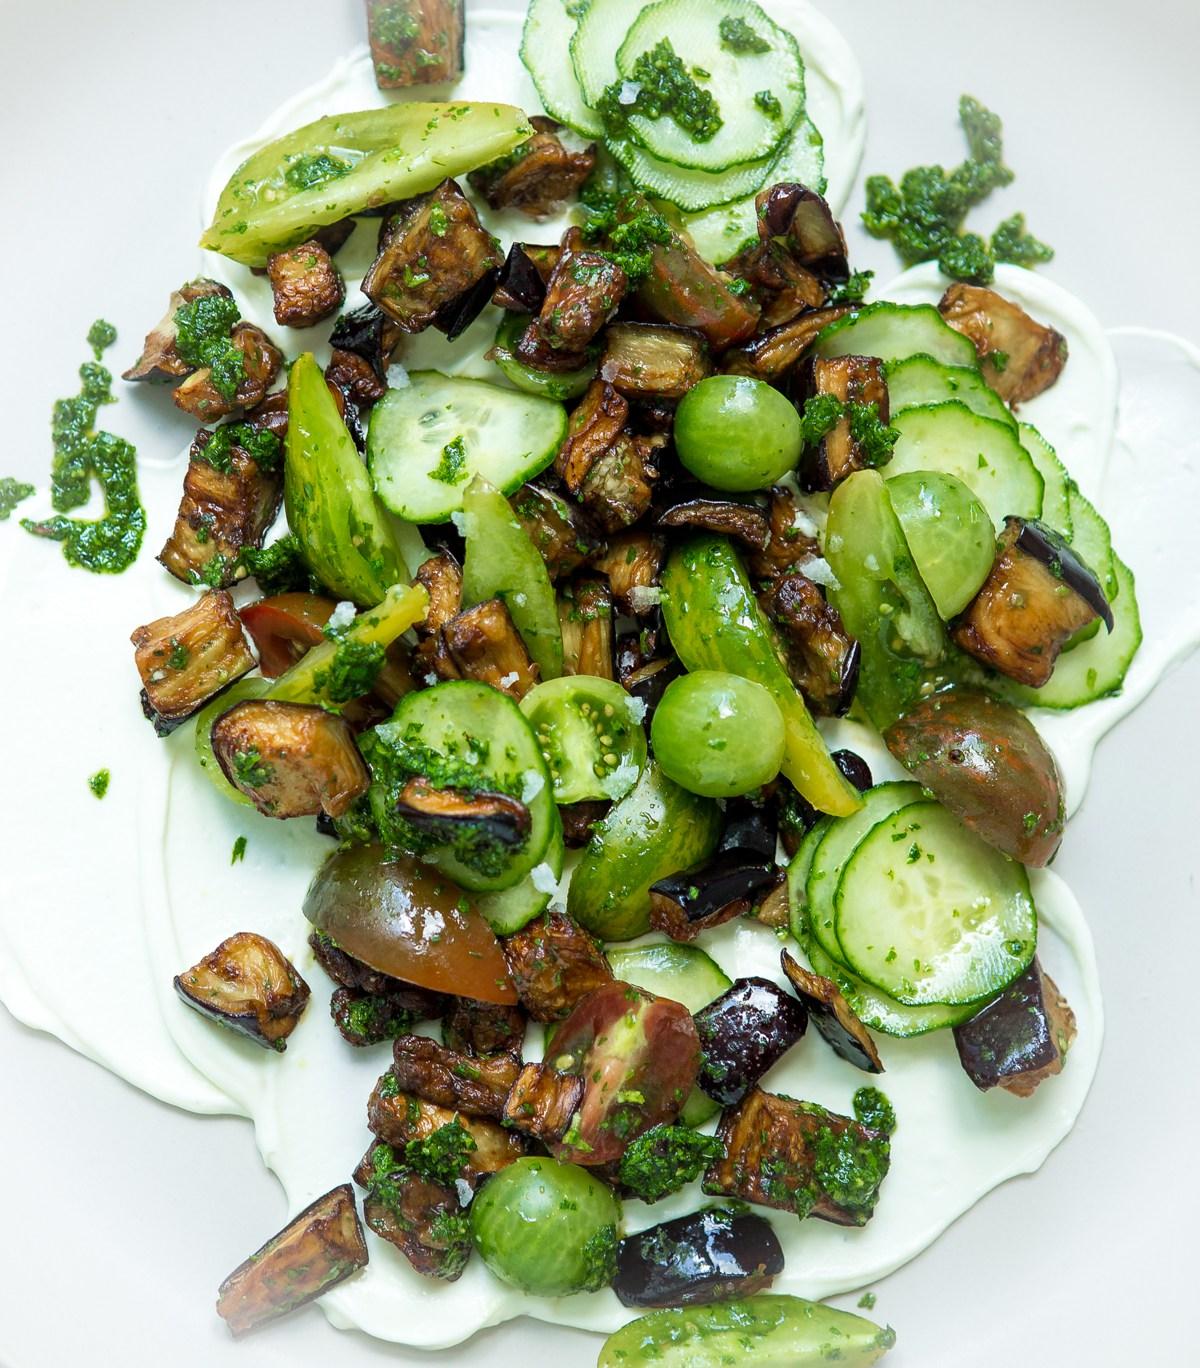 Heinen's Fried Eggplant Salad